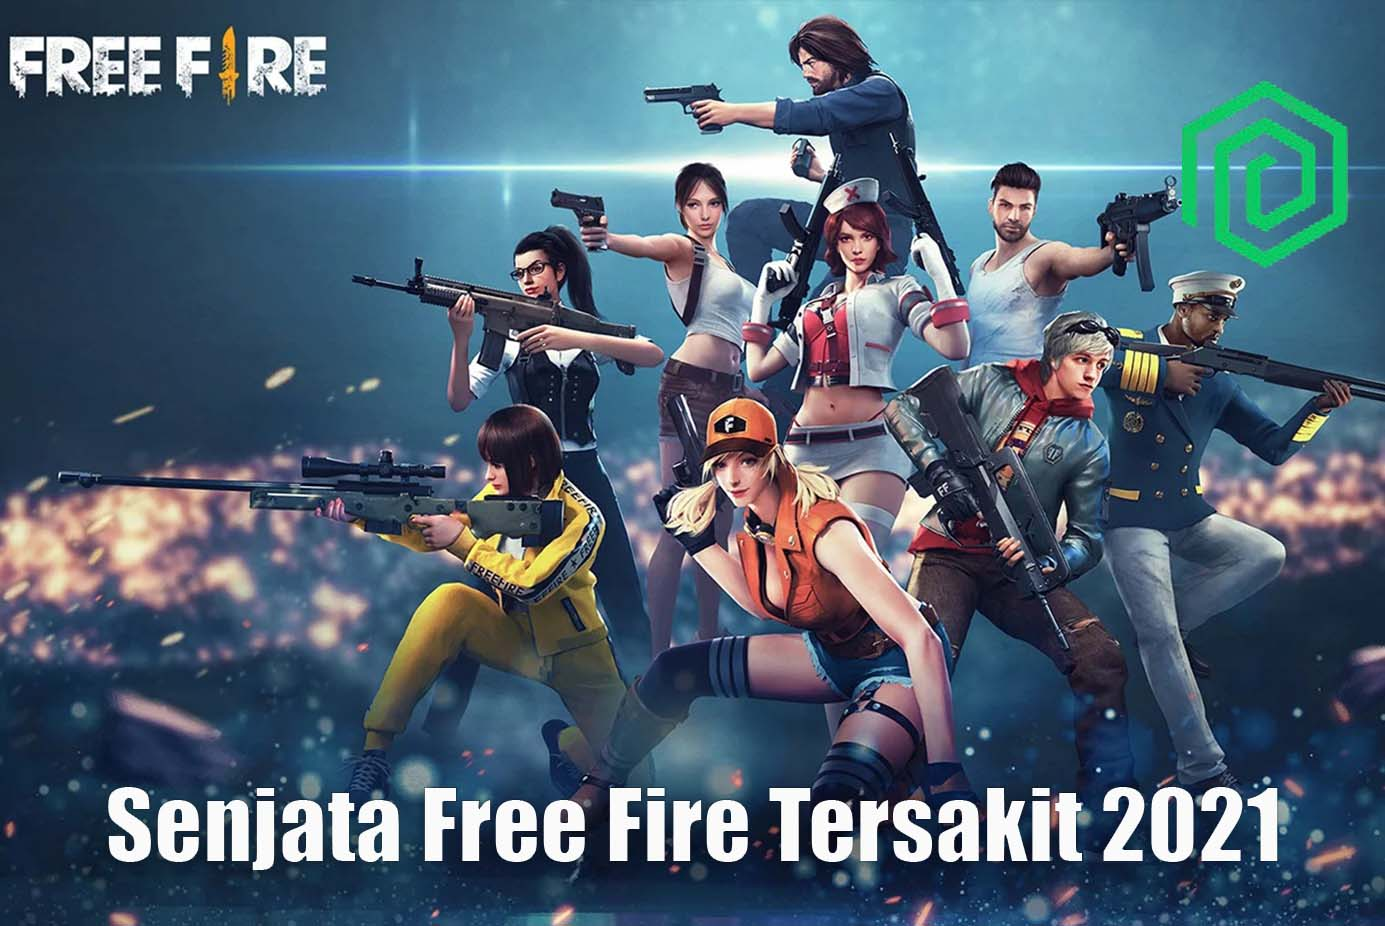 Senjata Free Fire Tersakit 2021